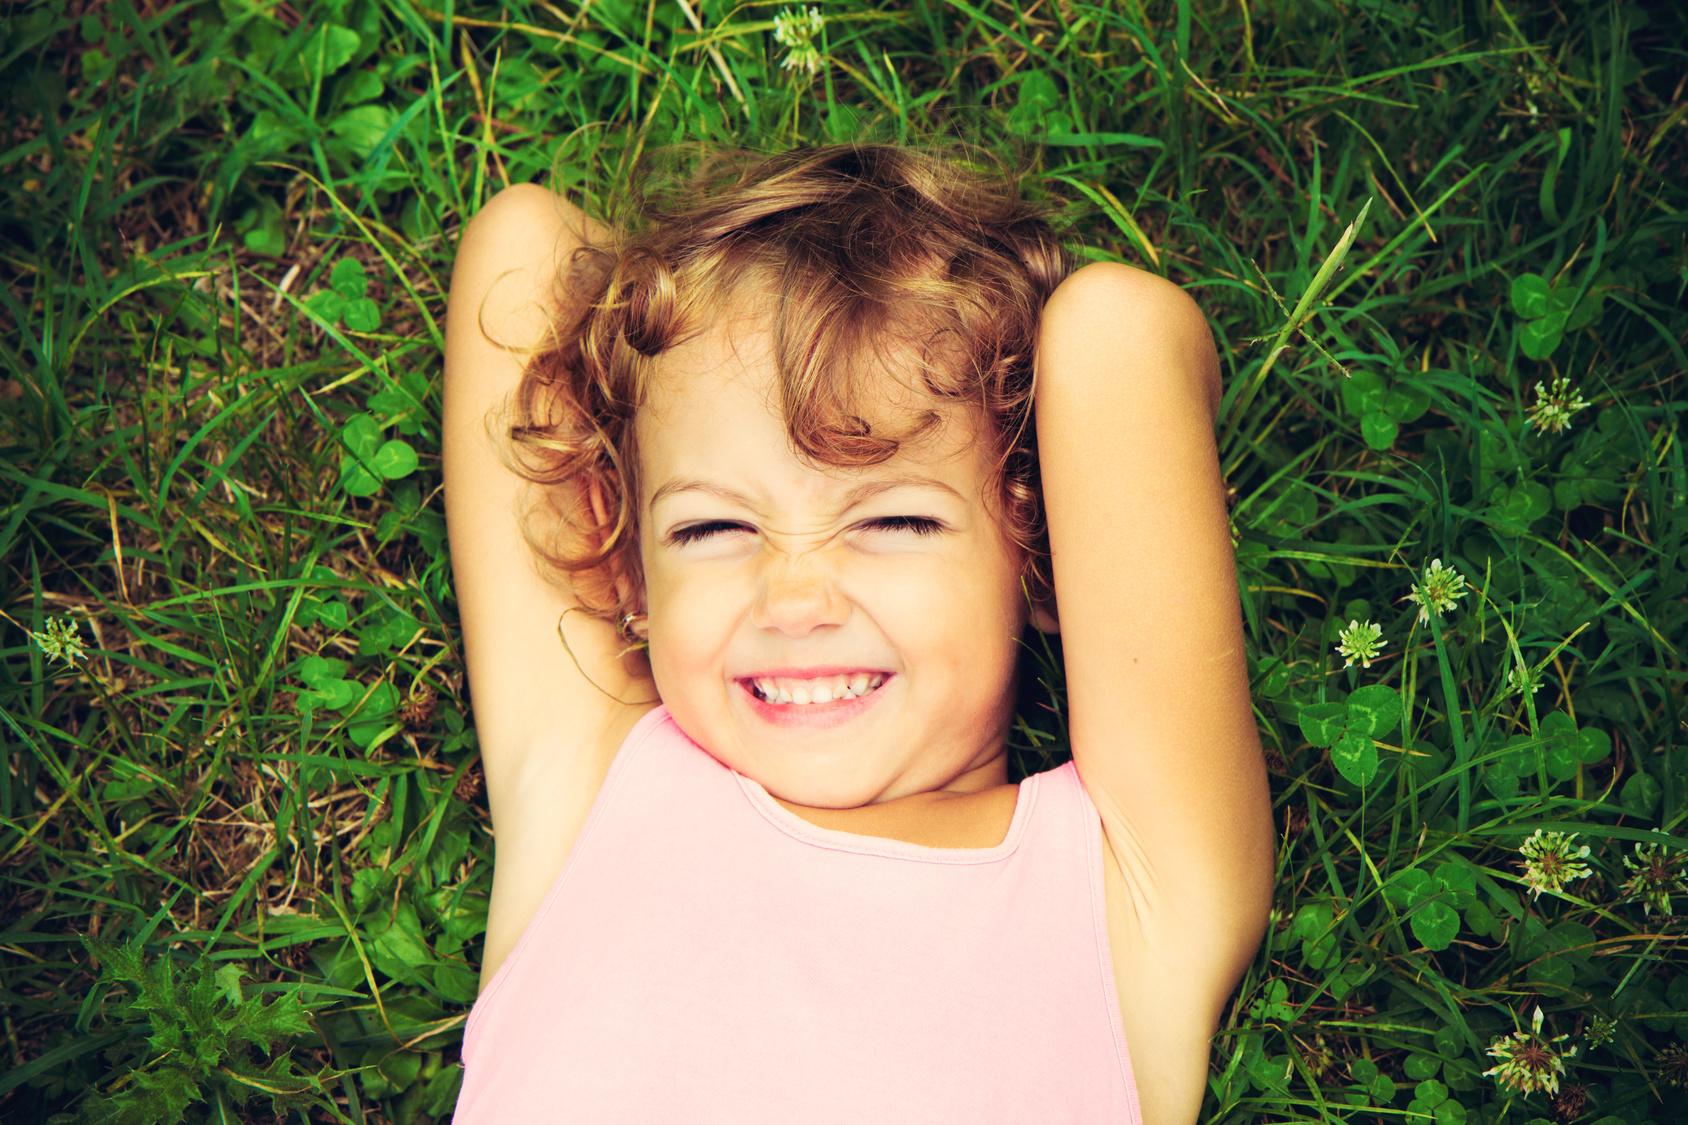 enfant apprendre à se relaxer